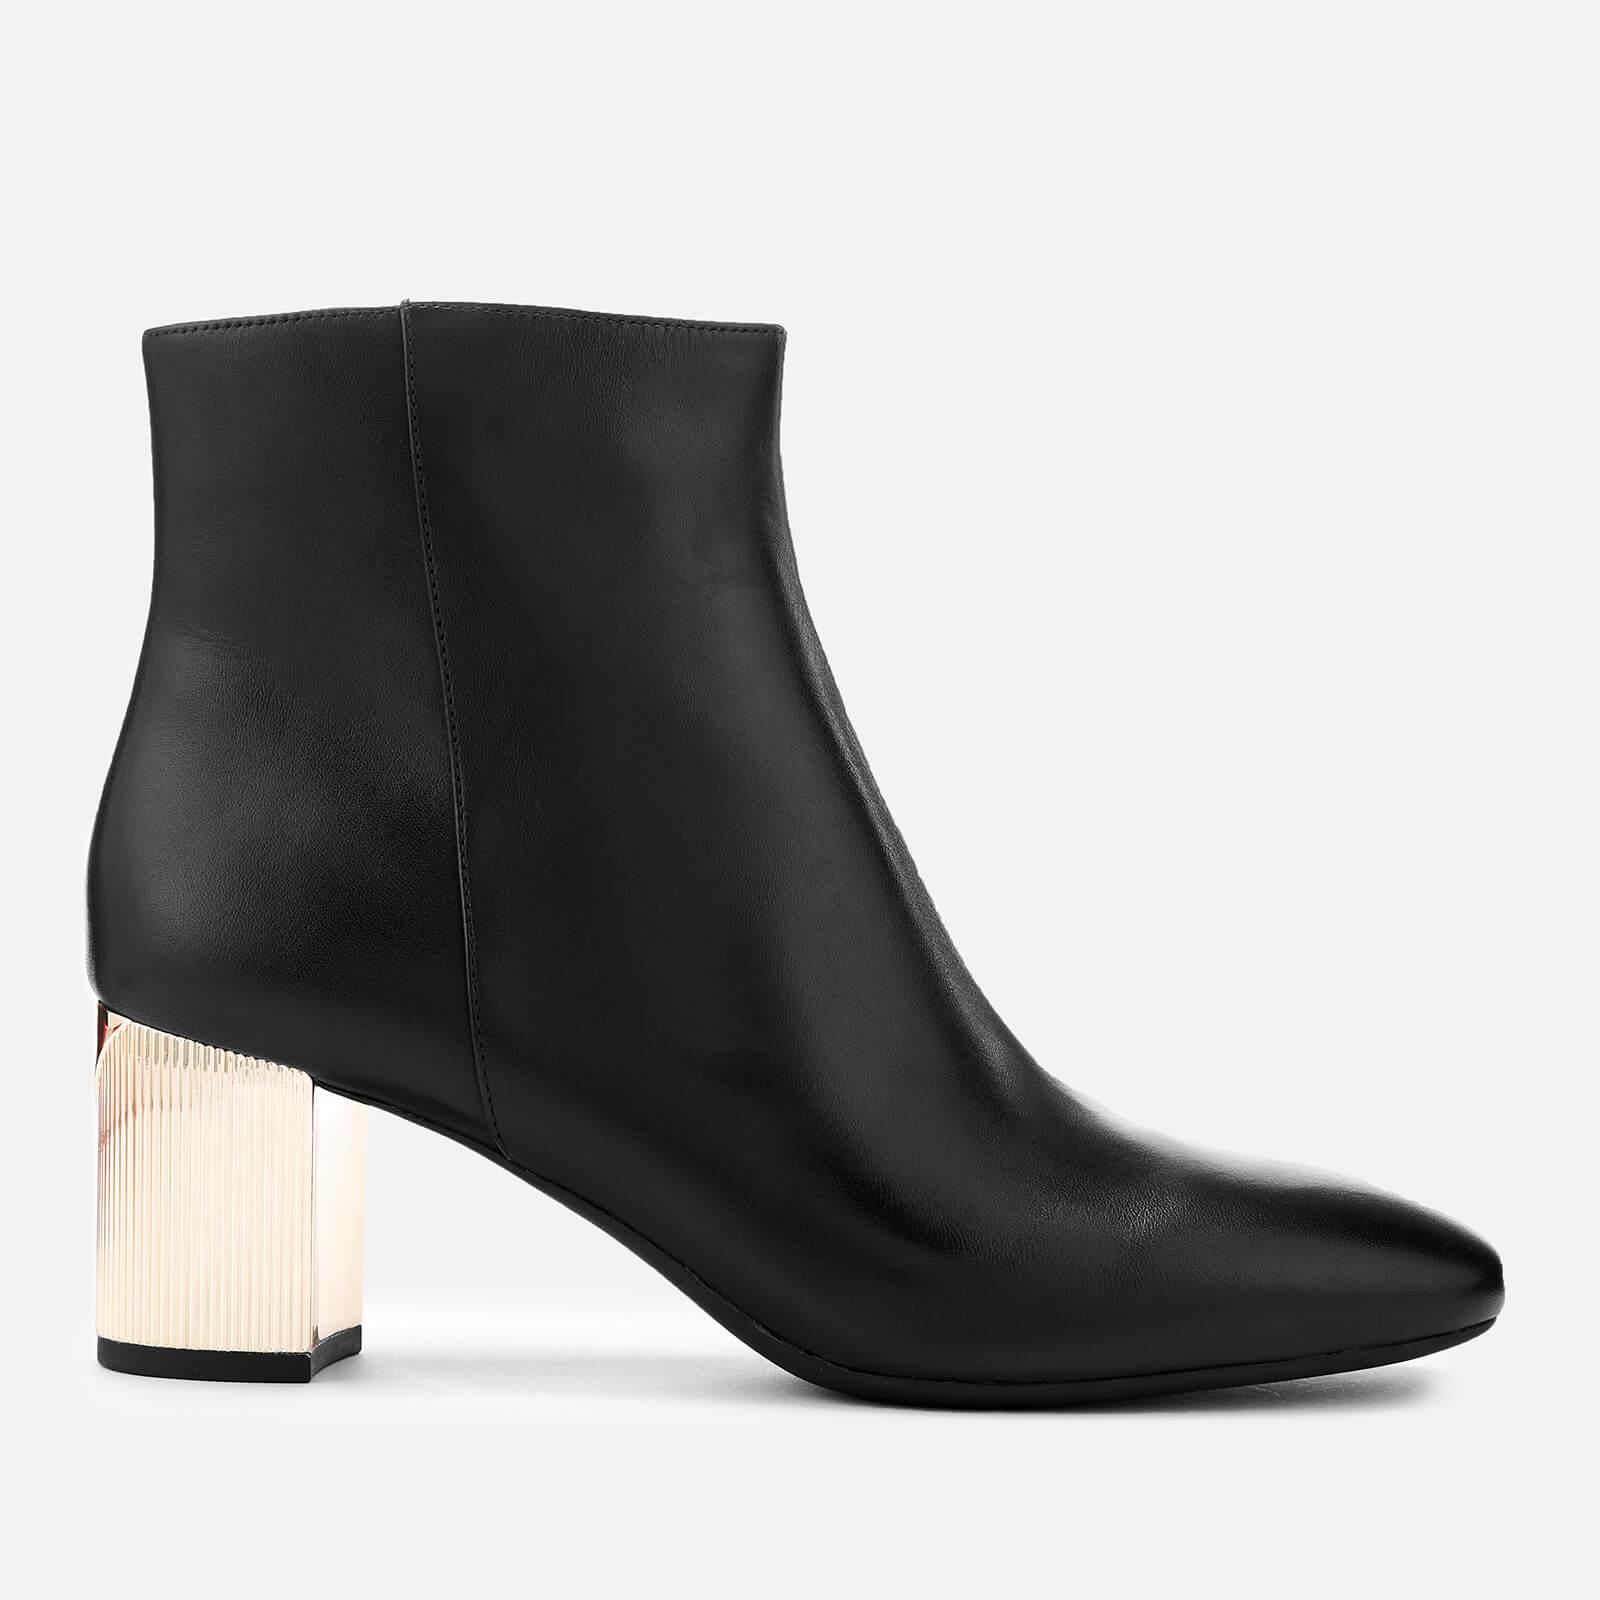 35bae1d22394 MICHAEL MICHAEL KORS Women's Paloma Leather Heeled Ankle Boots - Black  Womens Footwear   TheHut.com